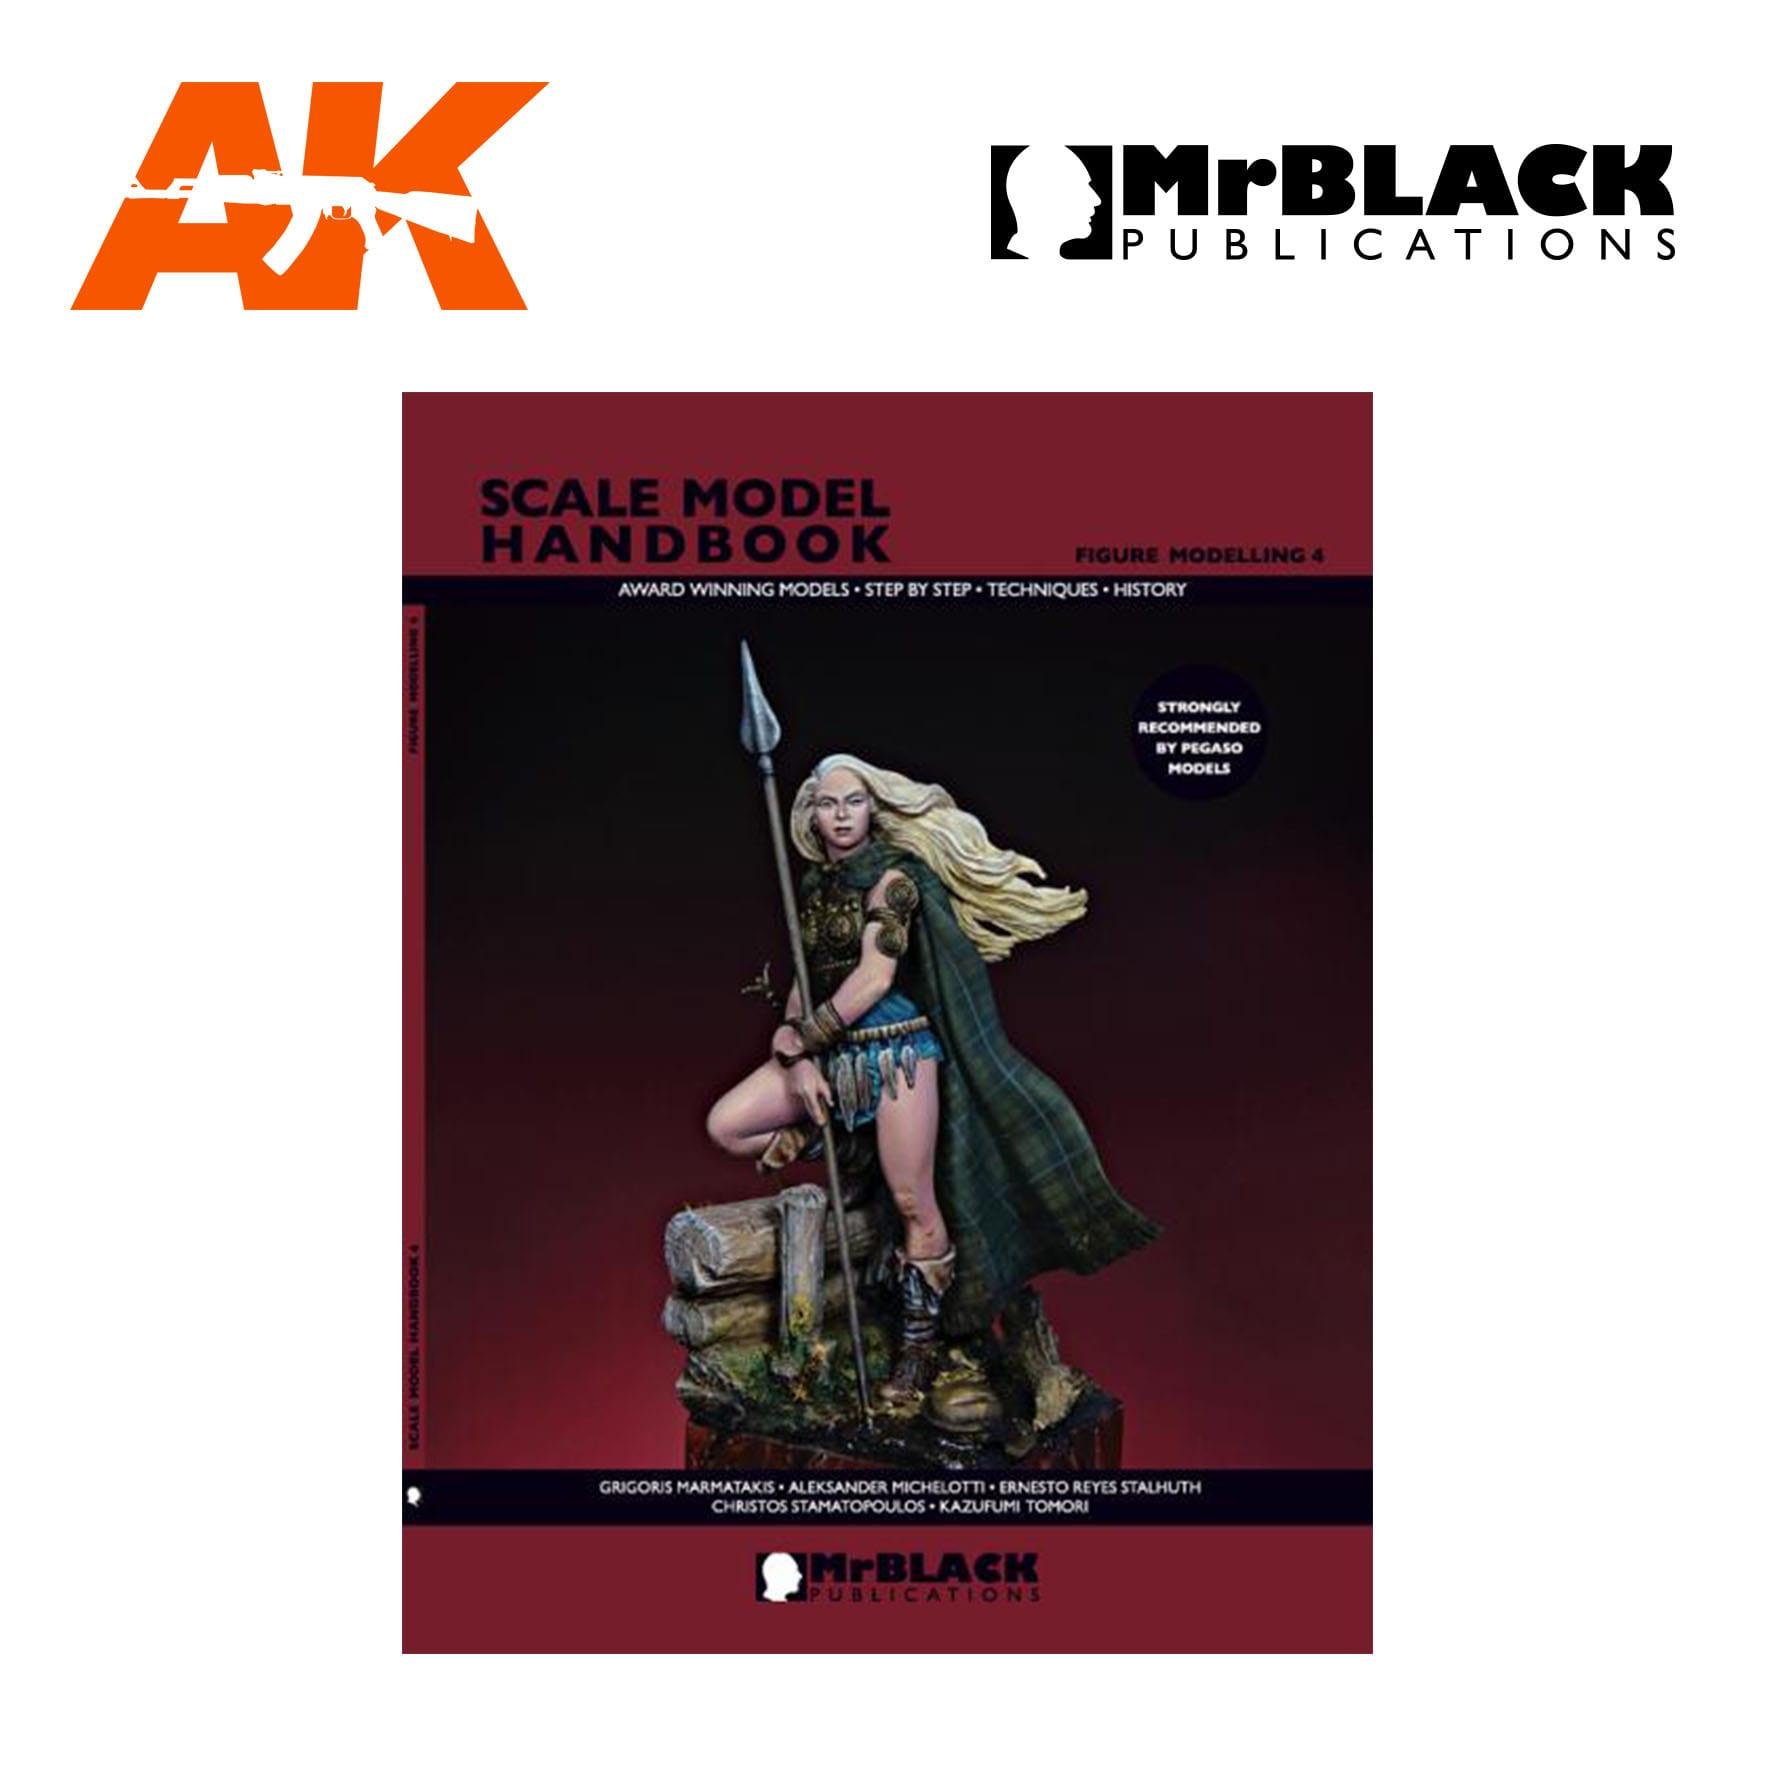 f22c4895232f5 Scale Model Handbook Figure modelling 4 mr black publications ak-interactive